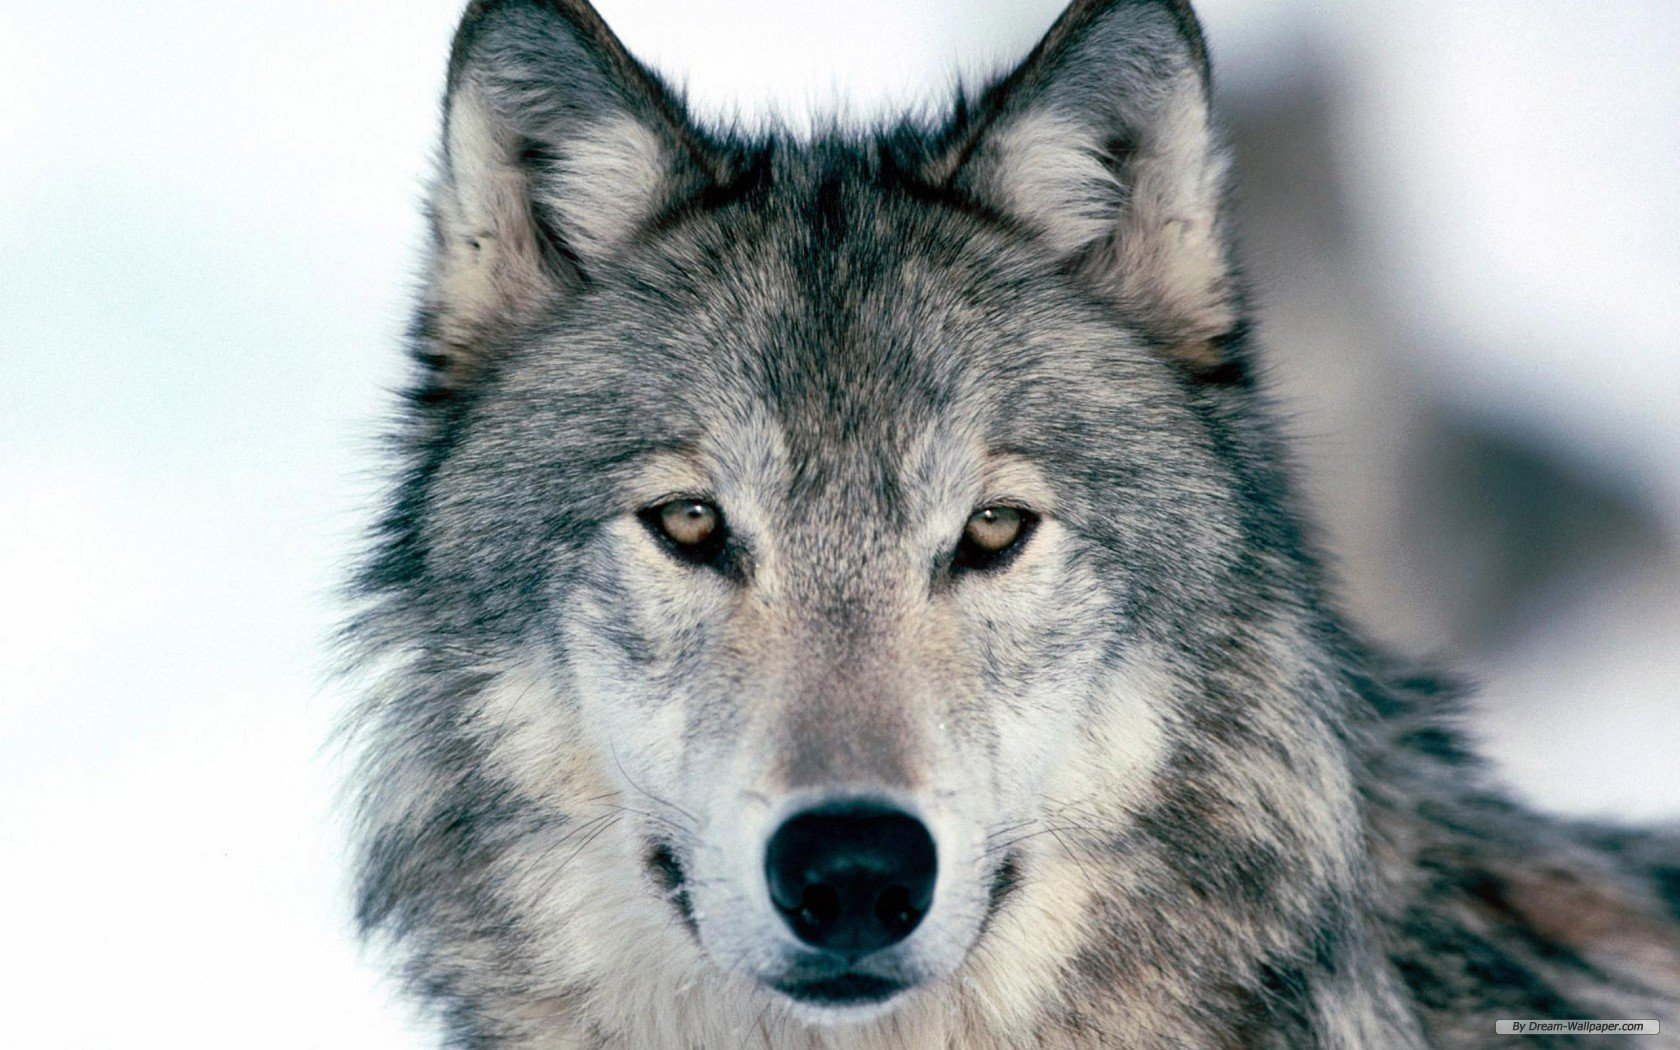 Wallpaper   Animal wallpaper   Wolf wallpaper   1680x1050 1680x1050